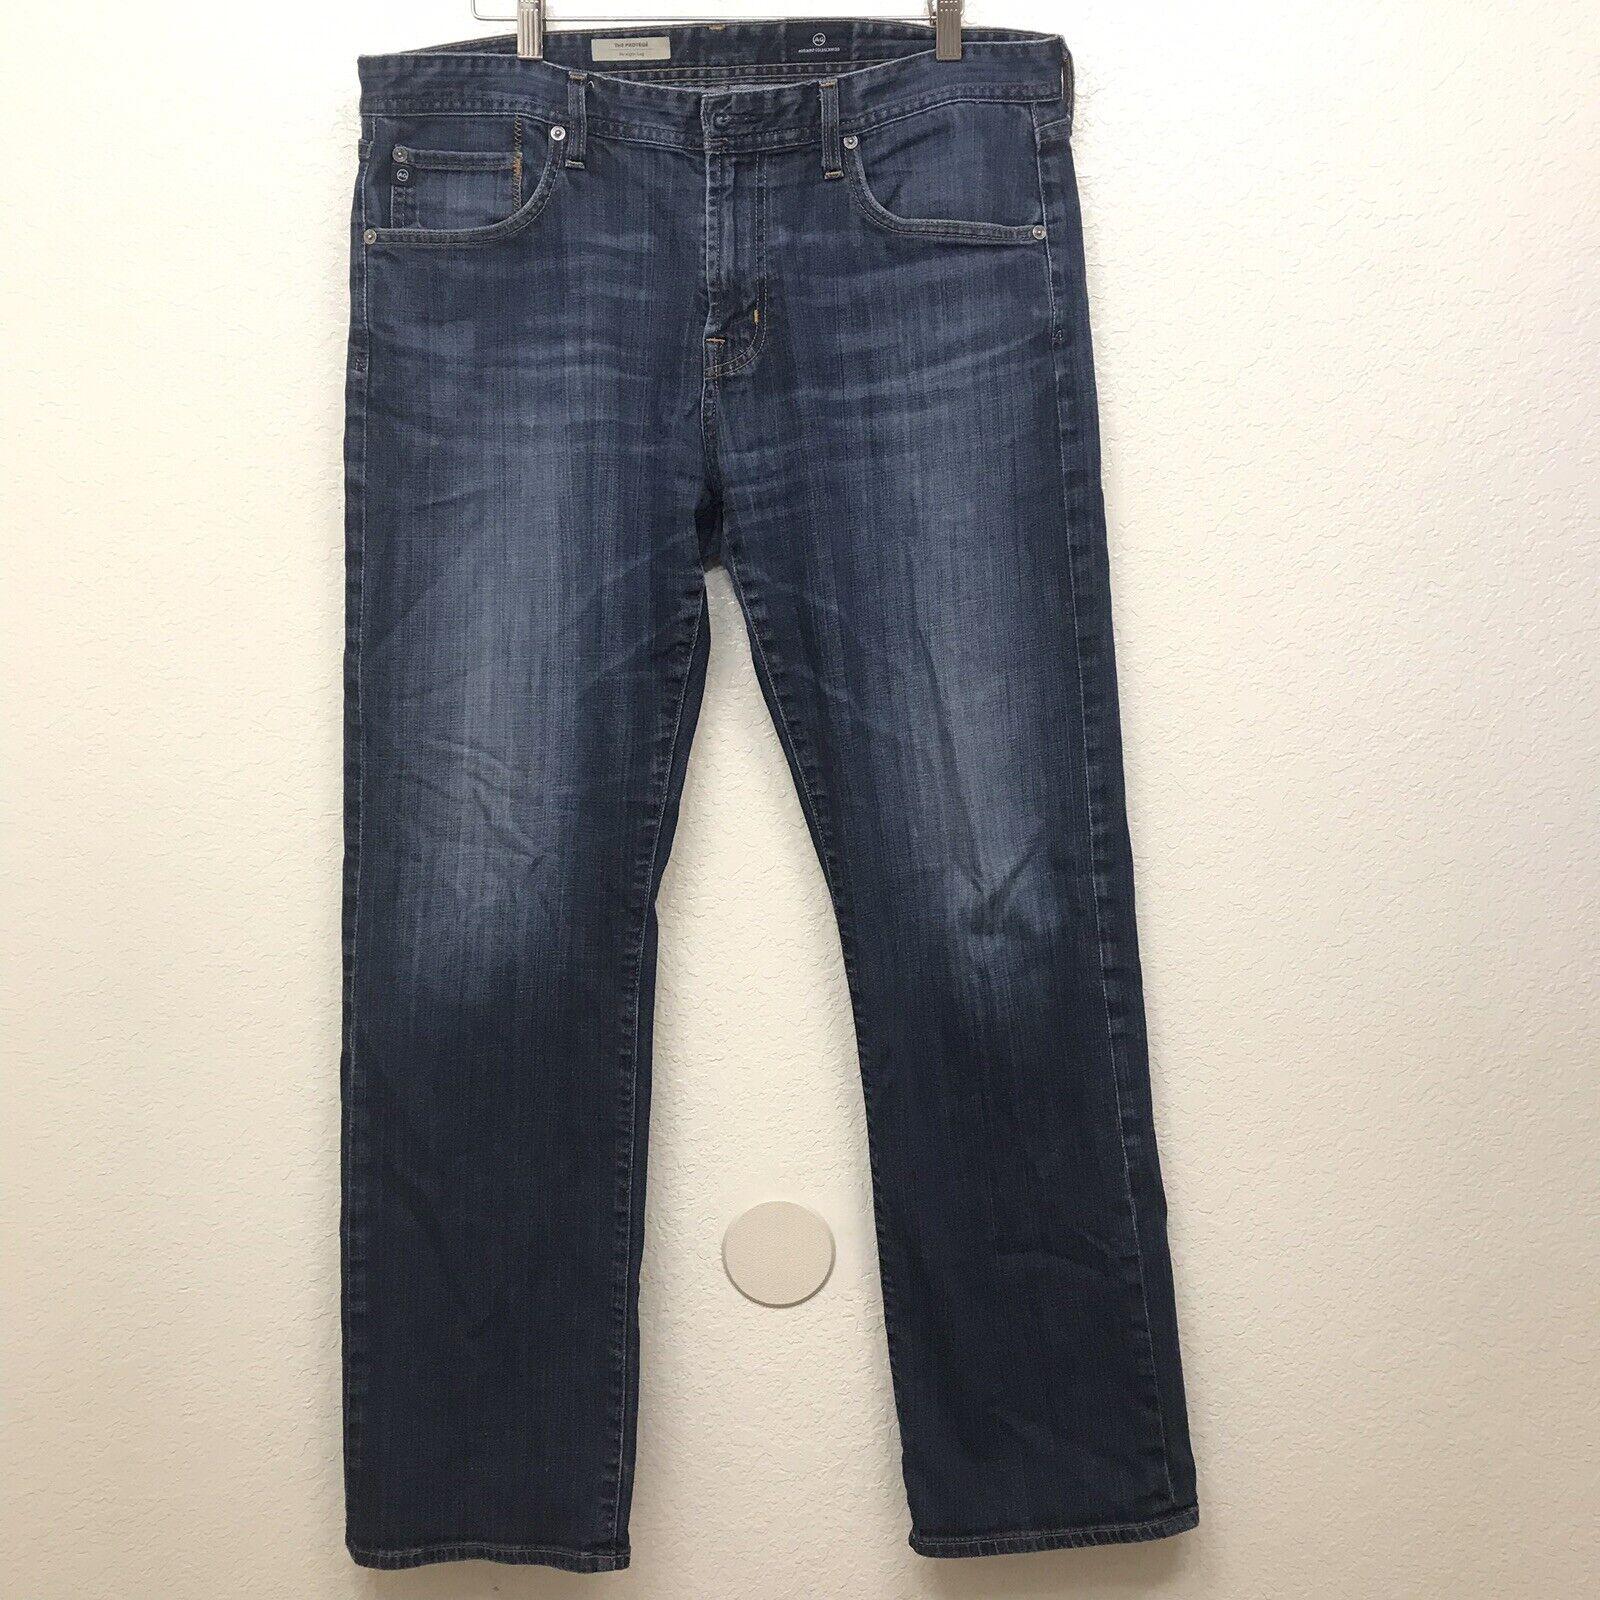 AG Adriano goldschmied Men's 36 x 32 The Predege Straight Leg bluee Jeans Denim